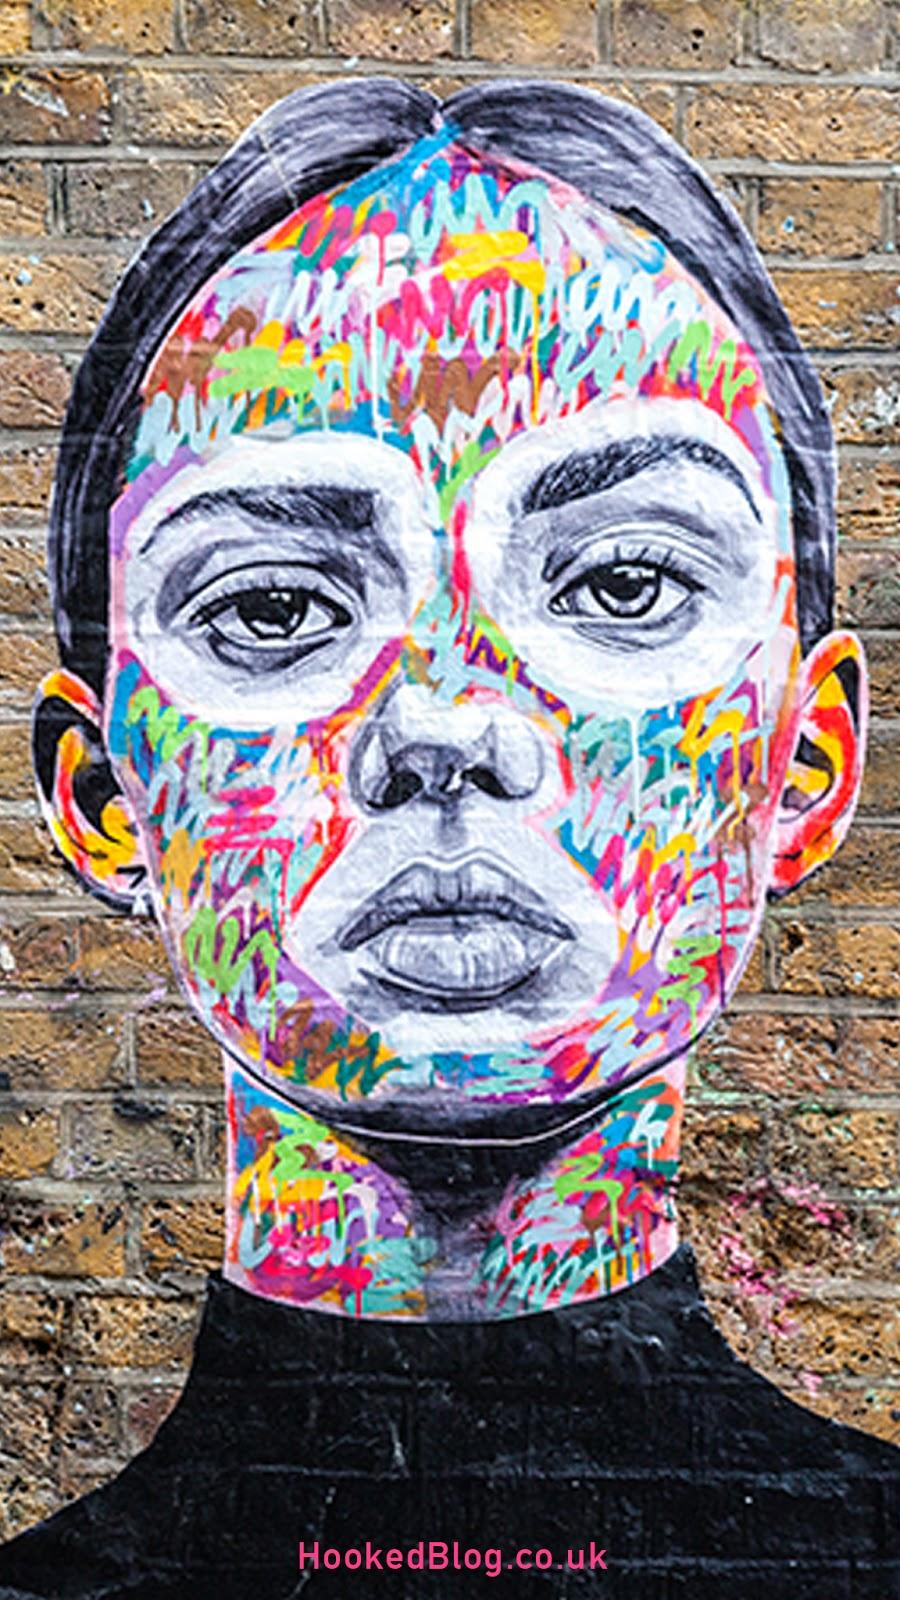 Antcarver, Street Art pasteups in London. Photo ©Hookedblog / Mark Rigney